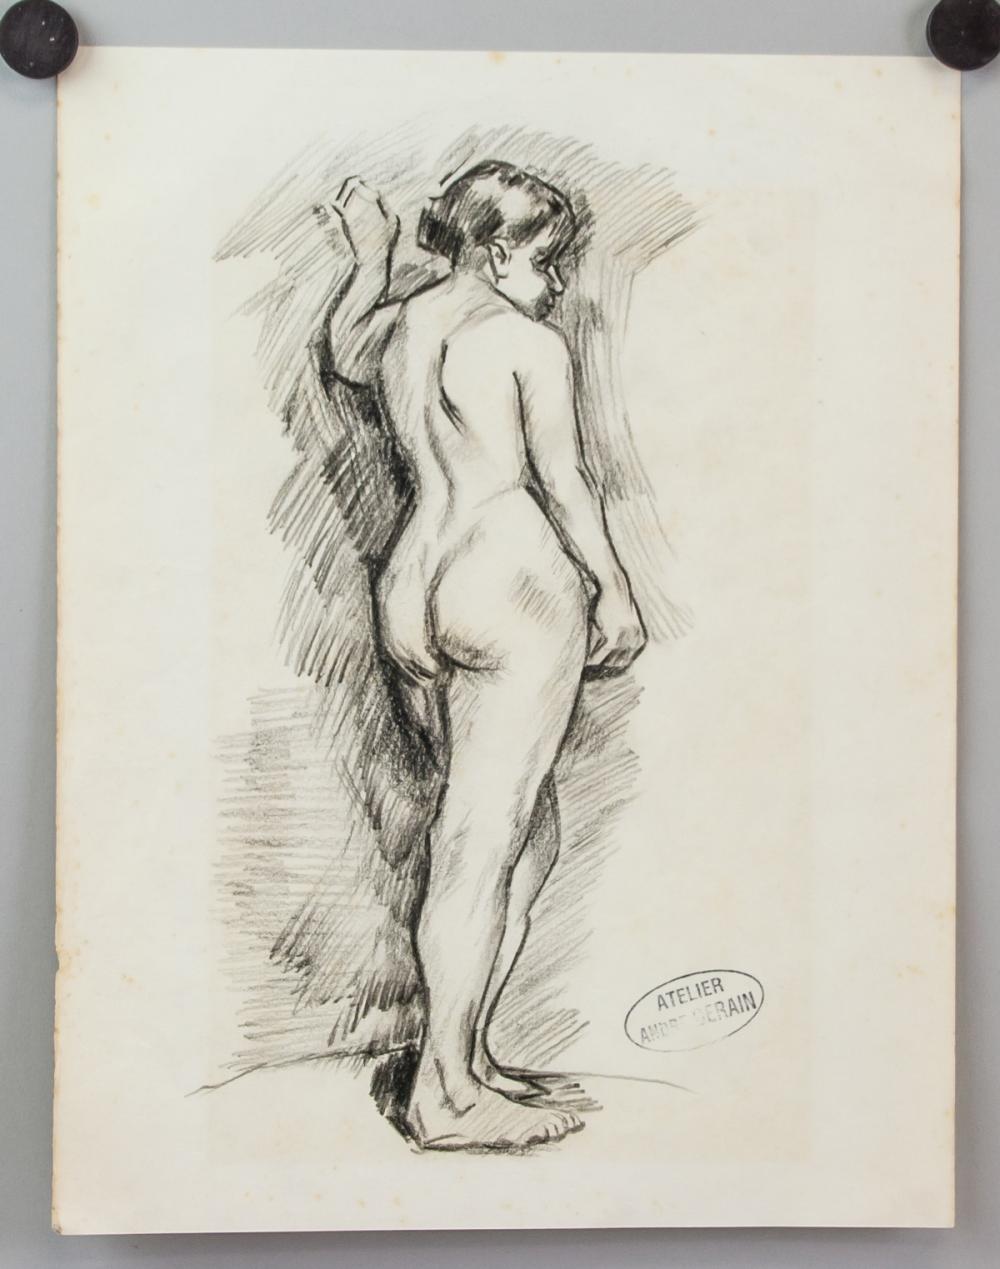 Lot 52: Andre Derain French School Graphite on Paper